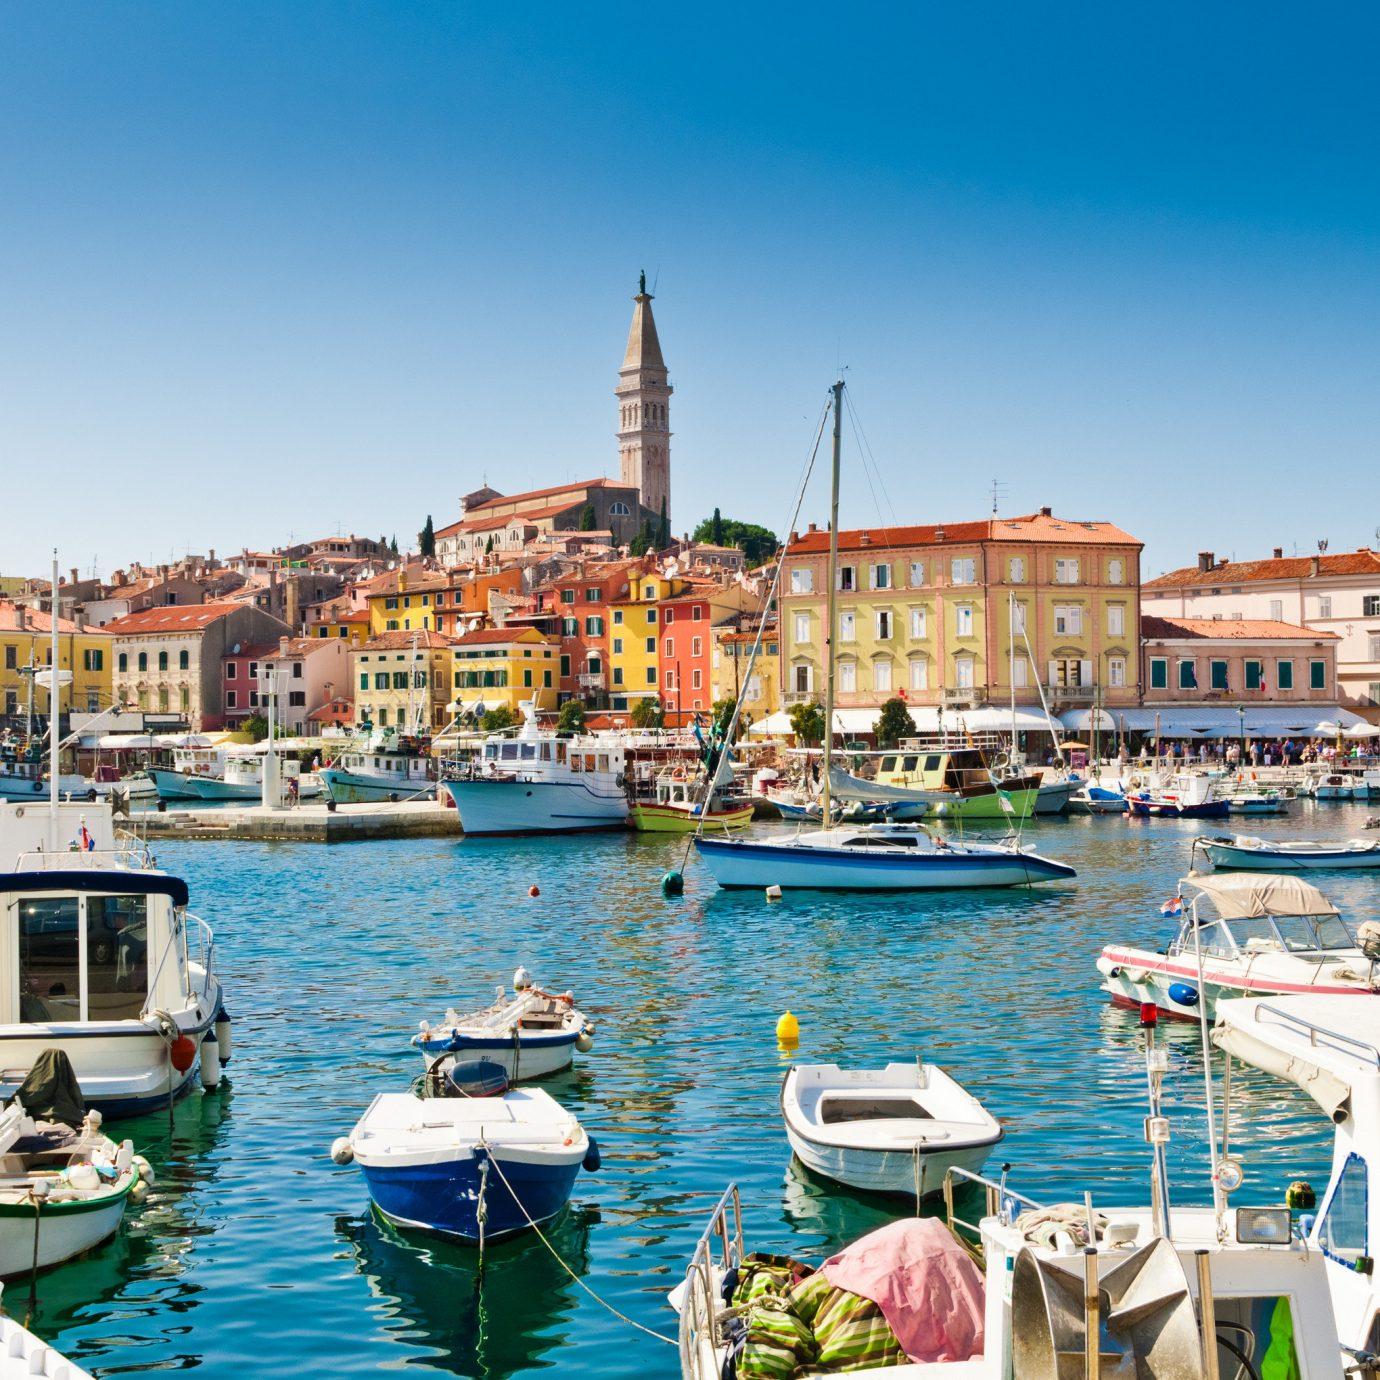 View of Rovinj, Croatia